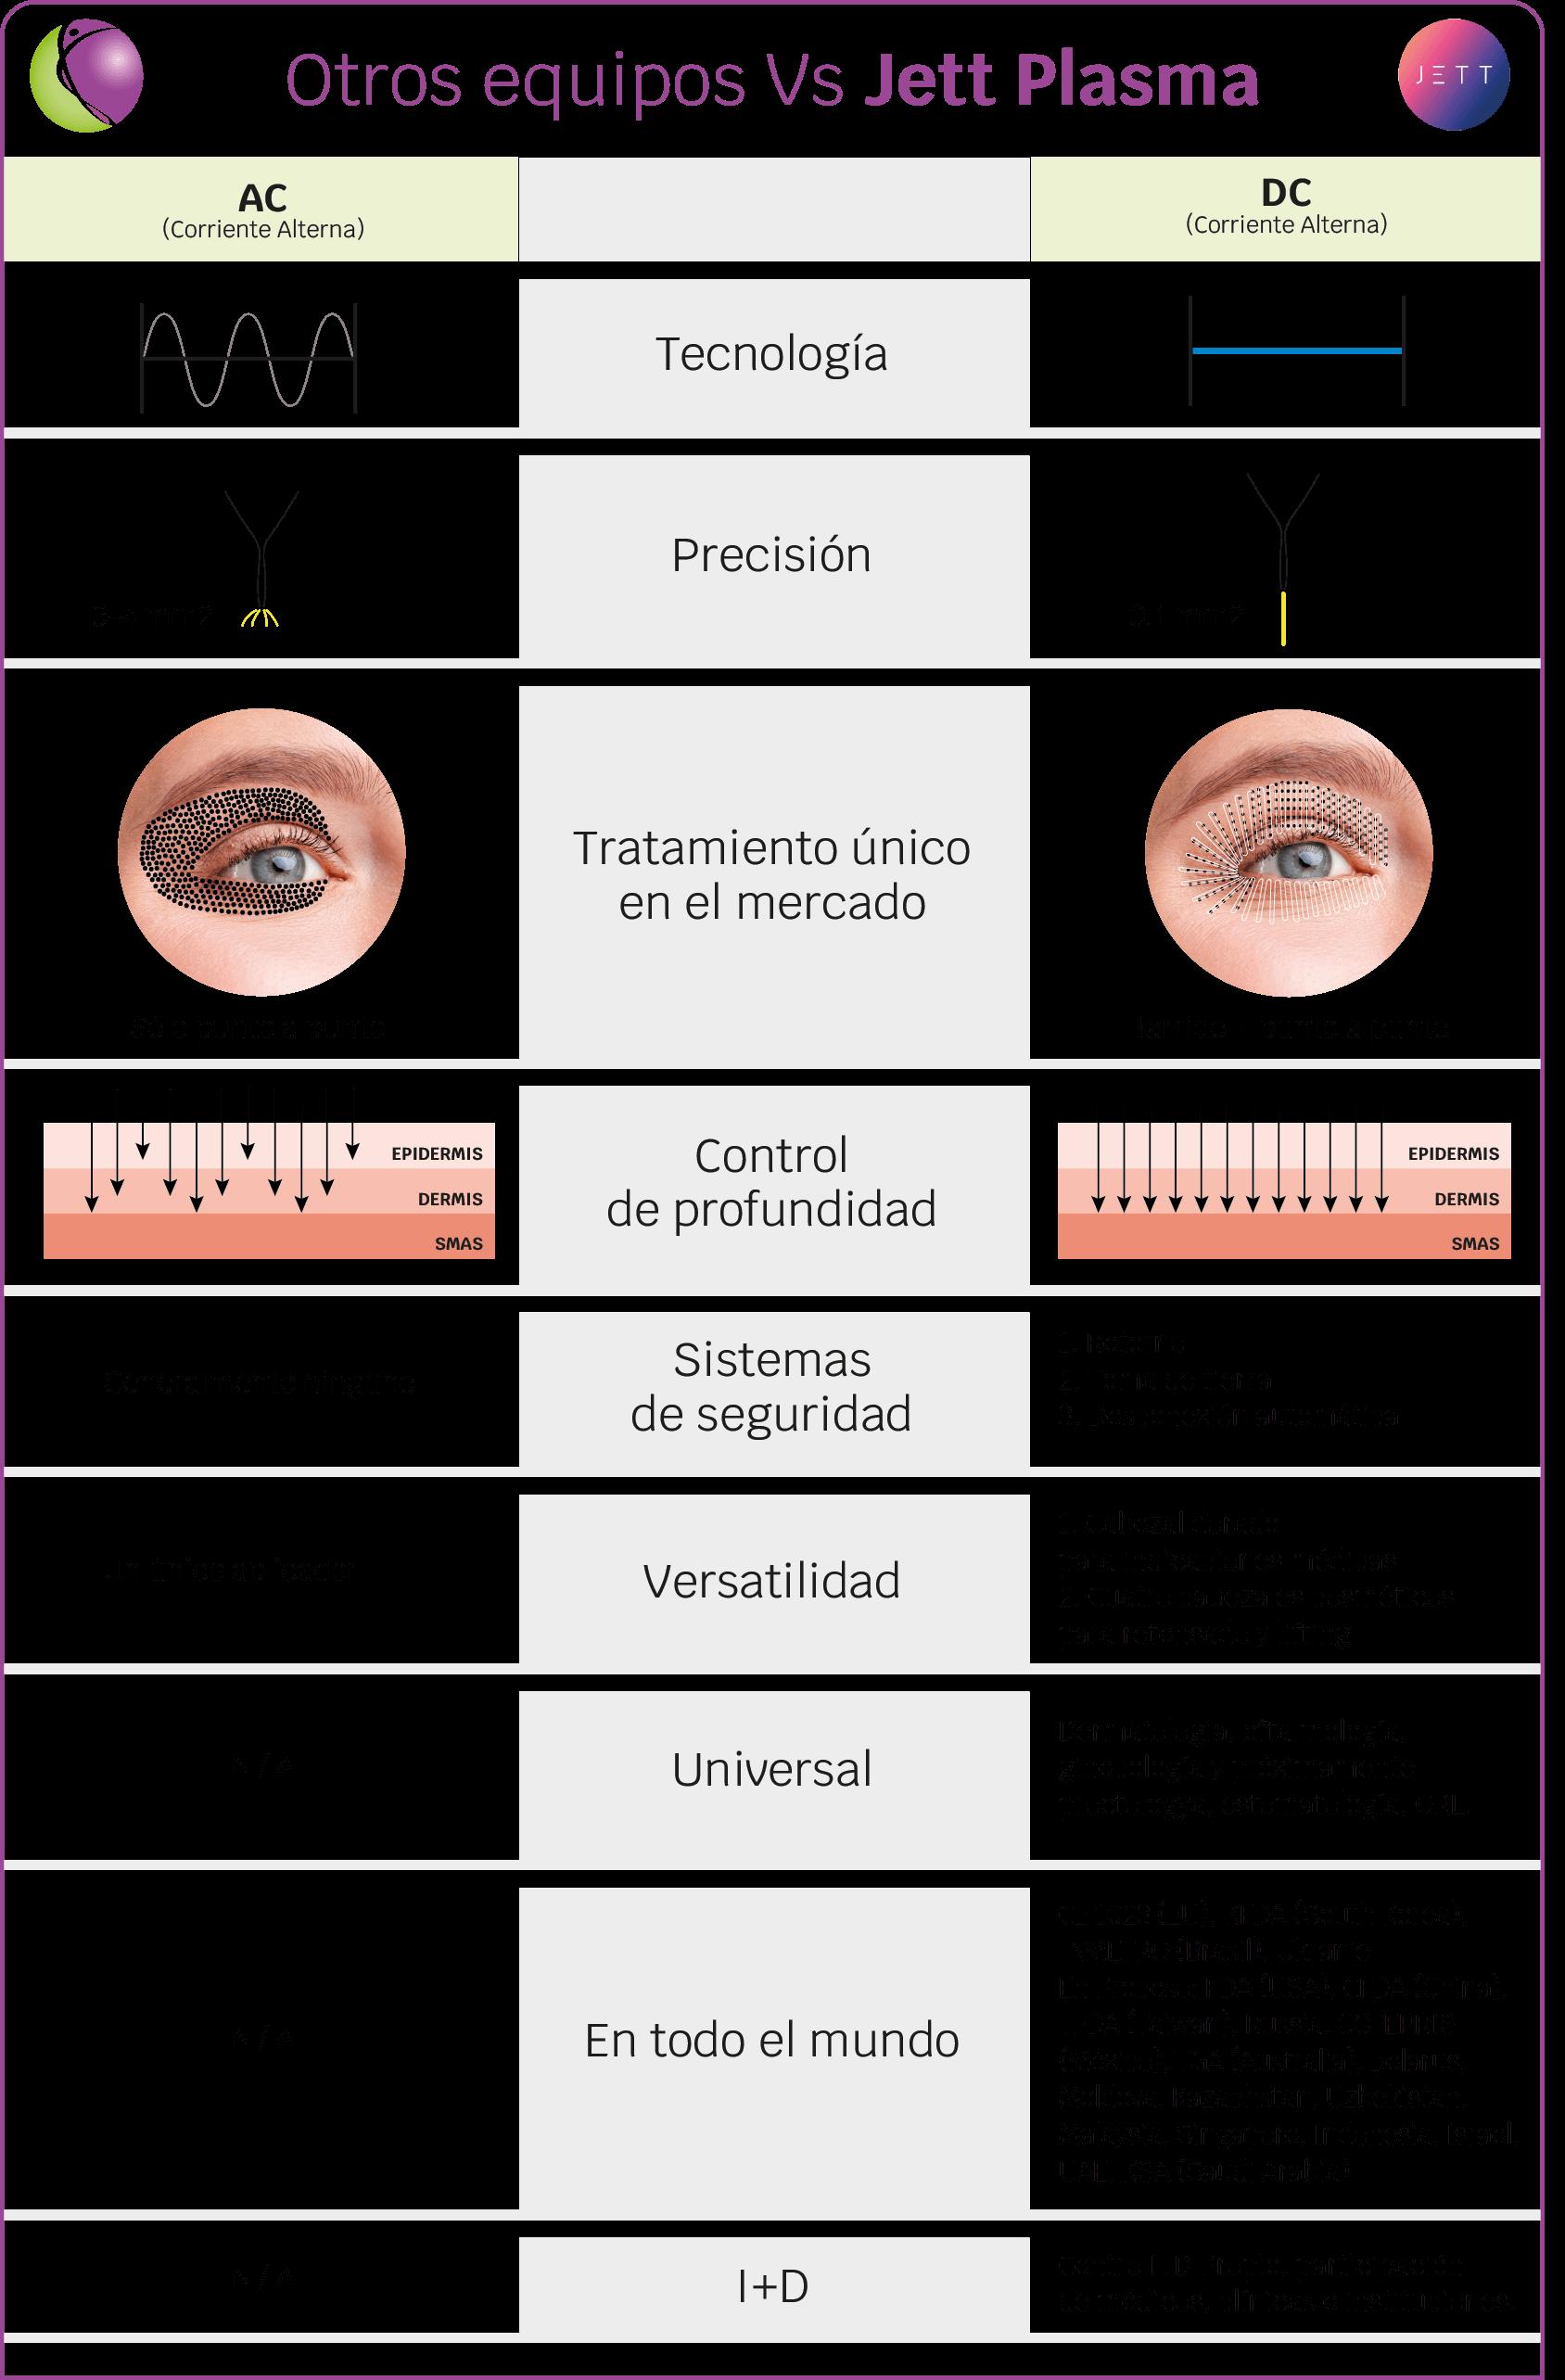 jettplasma